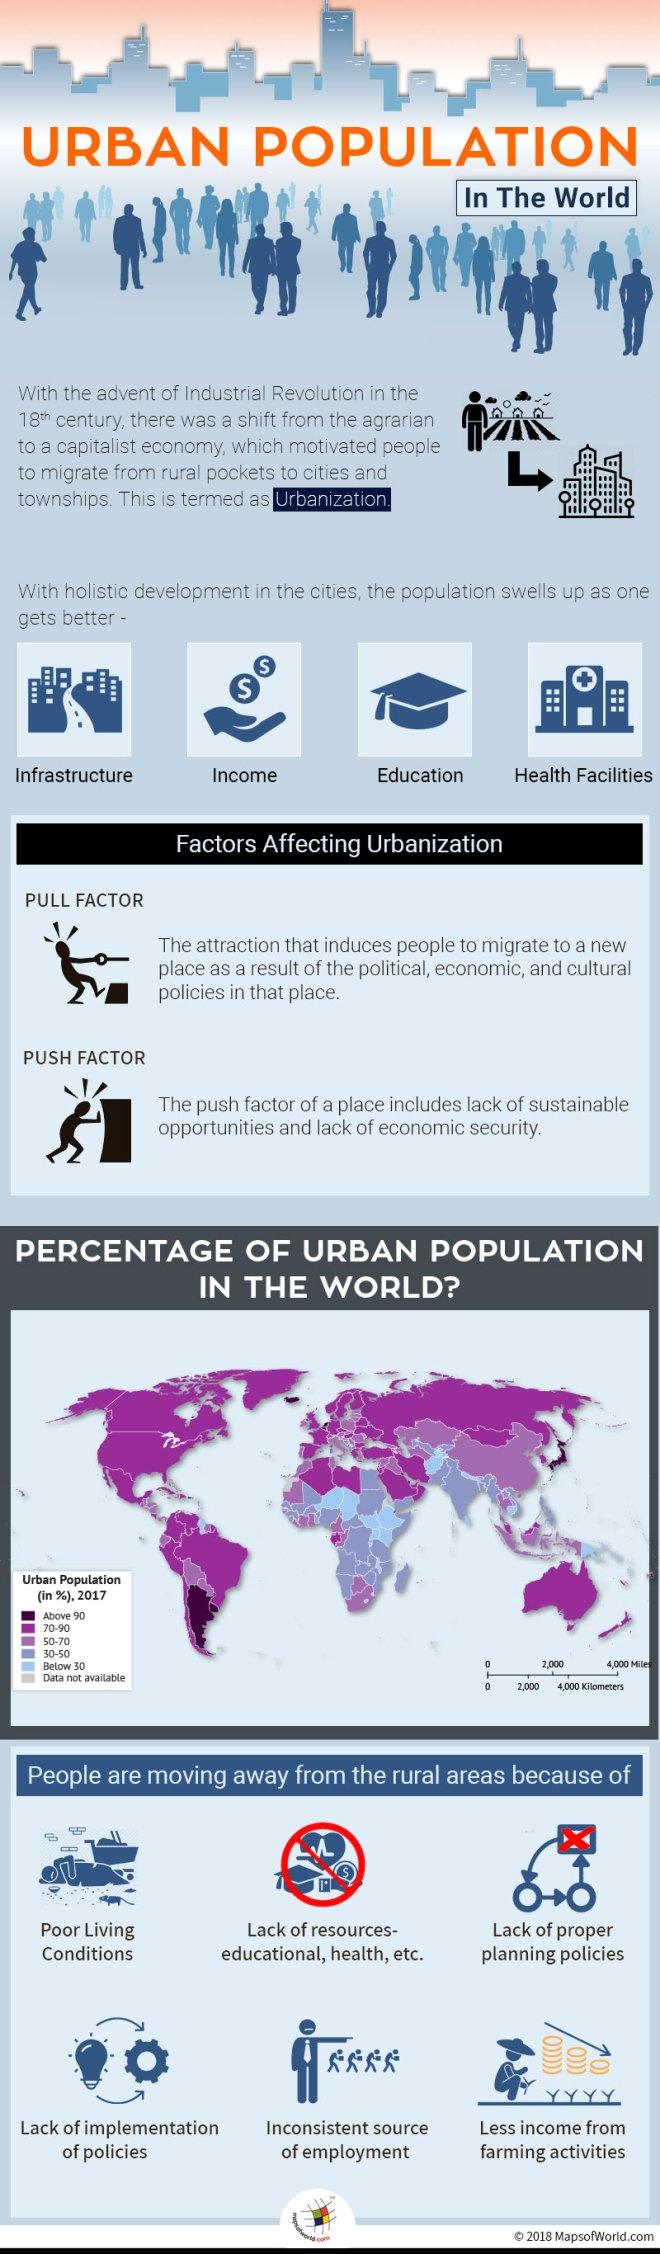 Infographic elaborating Global Urban Population